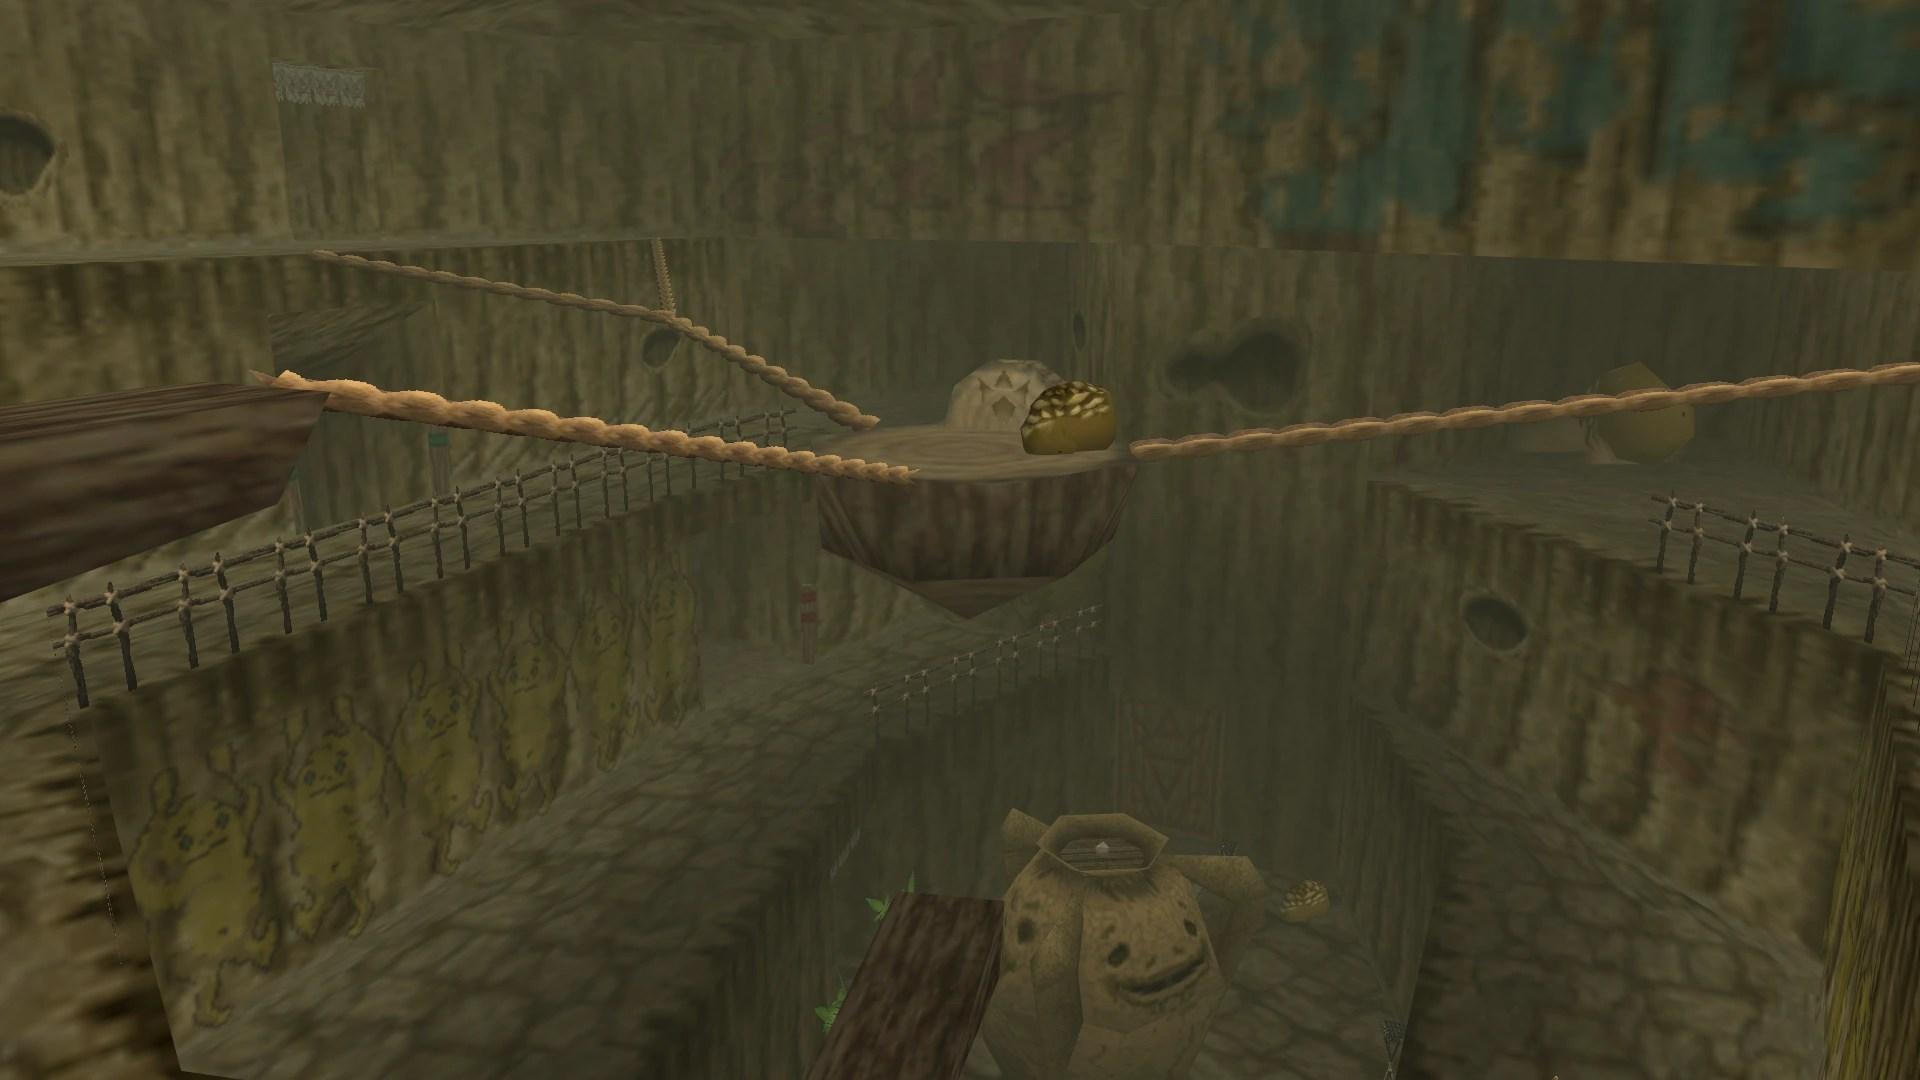 3d Changing Wallpaper Goron City Zeldapedia Fandom Powered By Wikia